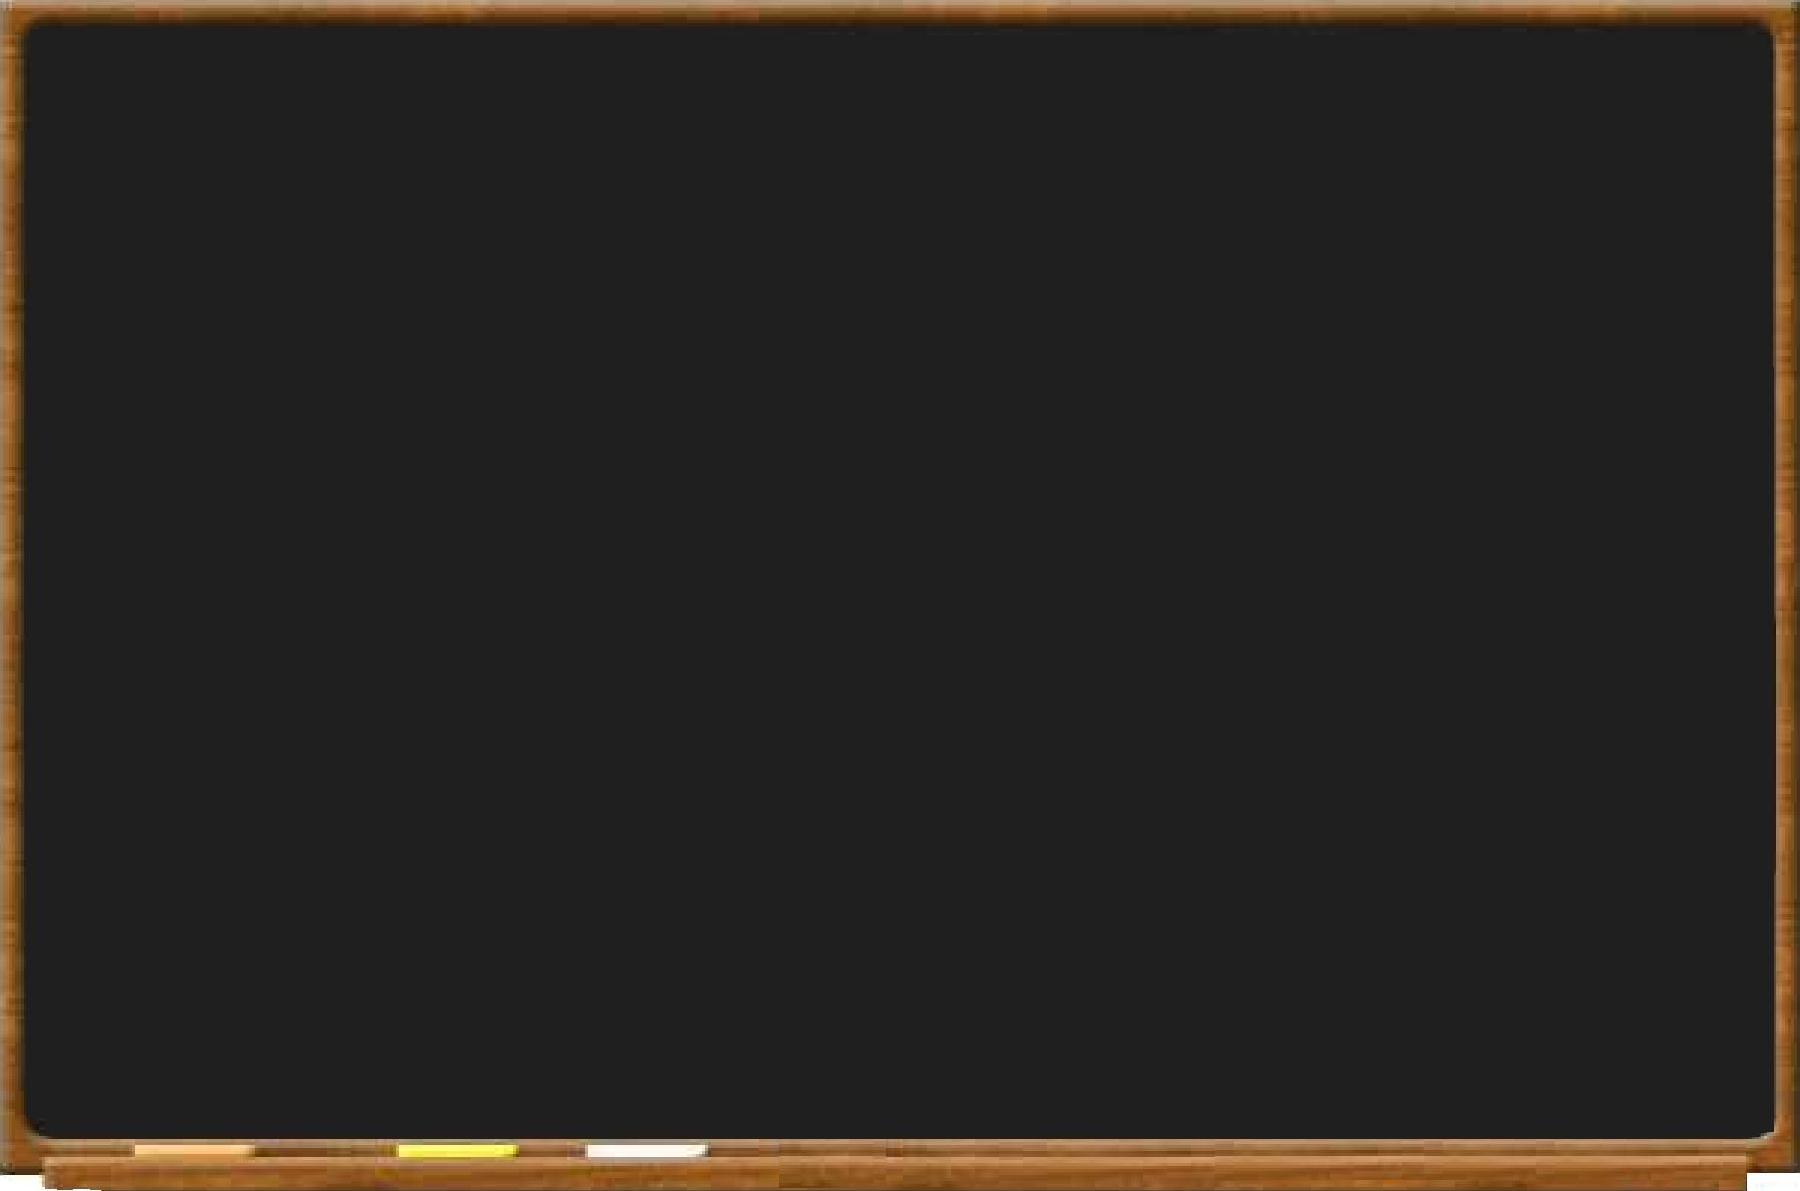 Blackboard Clipart - Clipart Suggest